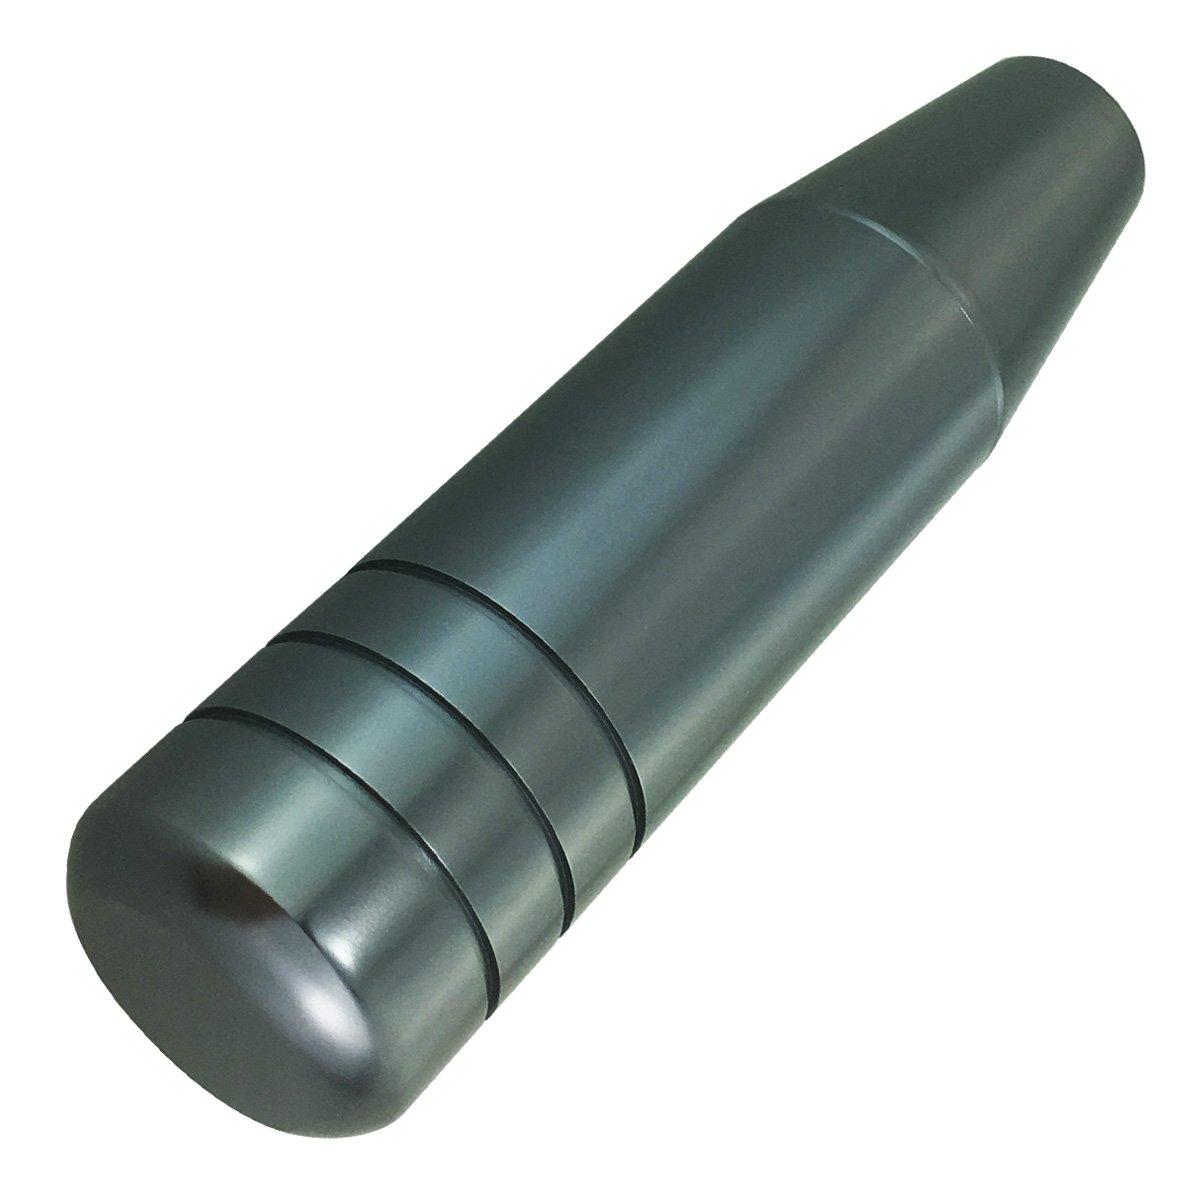 Abfer Universal Car Gear Stick Shifter Red Long Shift Knob Aluminum Automatic Knob Shifter Stick Shift Handle